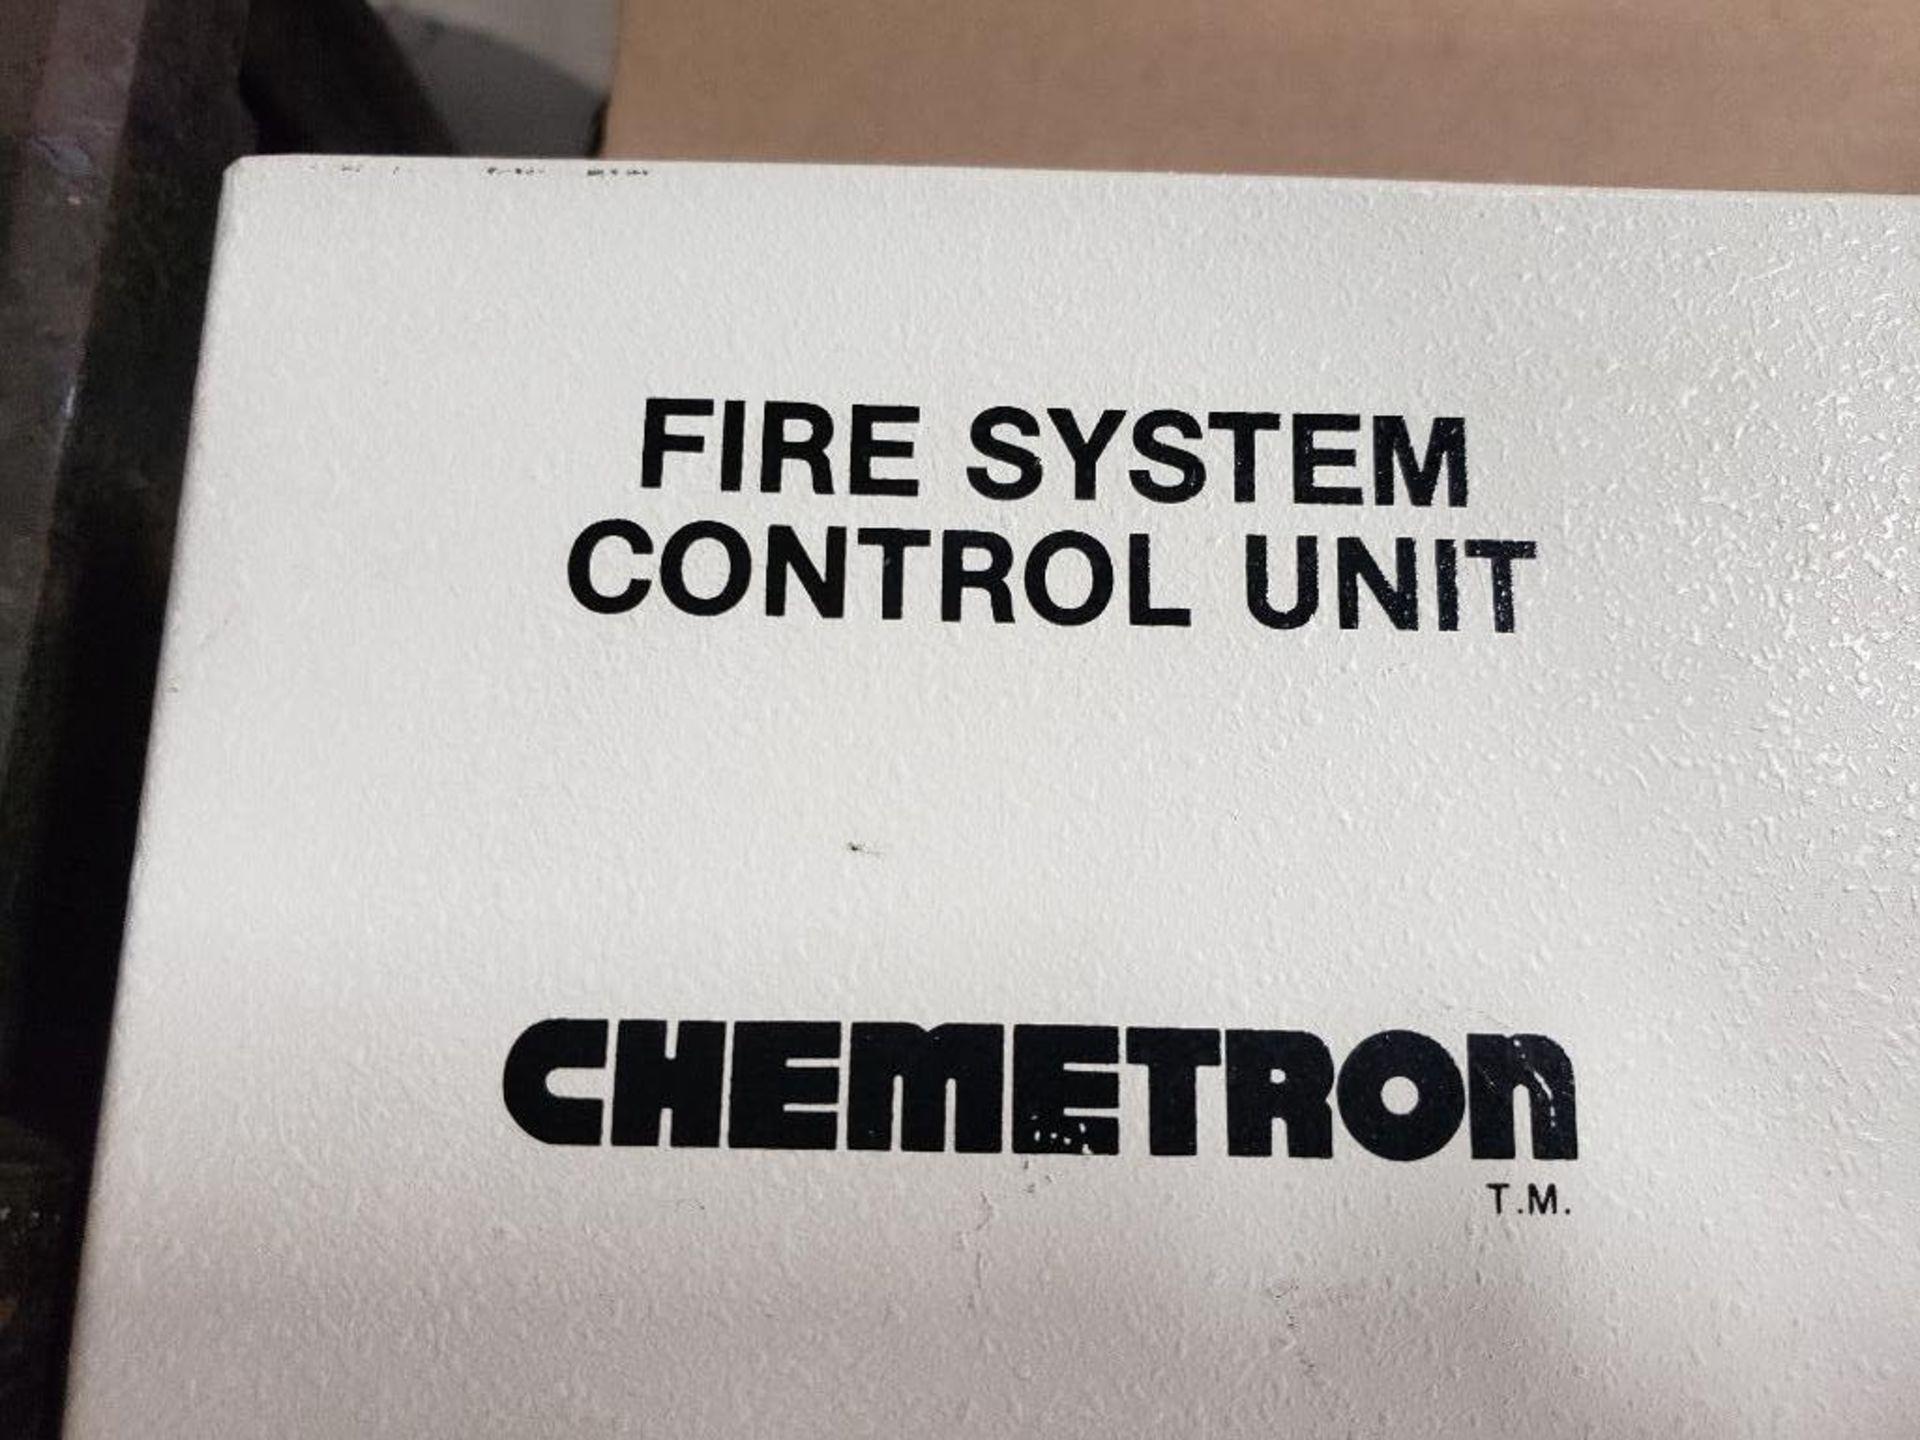 Chemetron Fire System control unit 1-010-0521-3. - Image 2 of 14